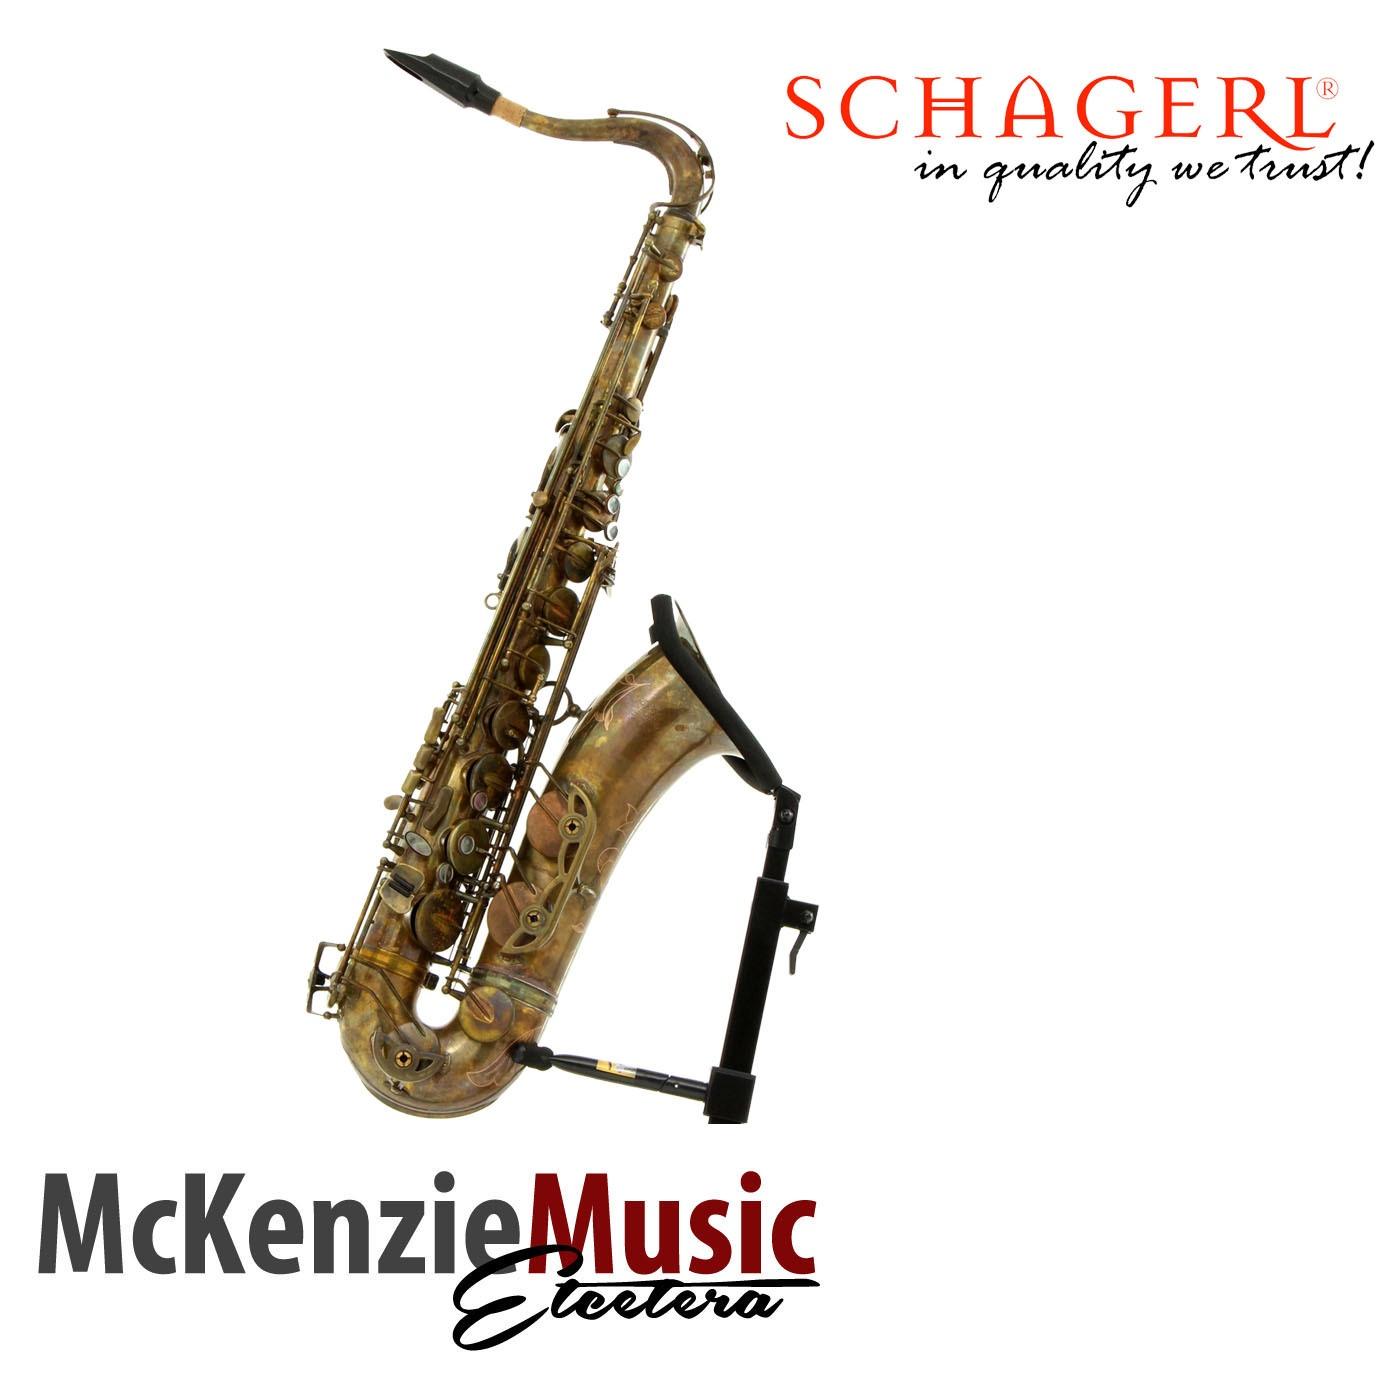 Schagerl Superior Tenor Saxophone